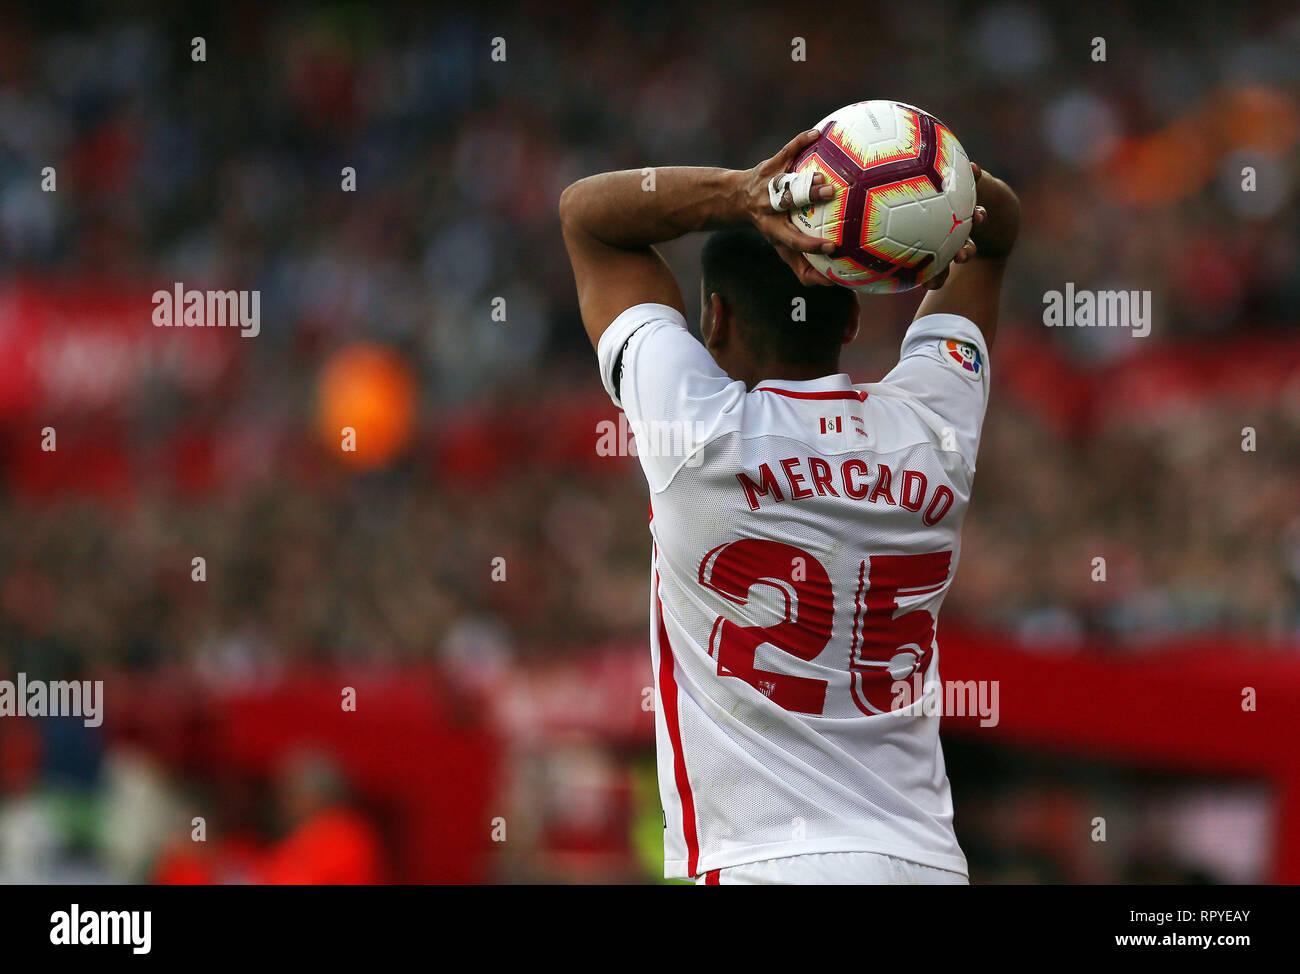 Gabriel Mercado (Sevilla FC) seen in action during the La Liga match between Sevilla FC and Futbol Club Barcelona at Estadio Sanchez in Seville, Spain. ( Final score; Sevilla FC 2:4 Futbol Club Barcelona ) - Stock Image